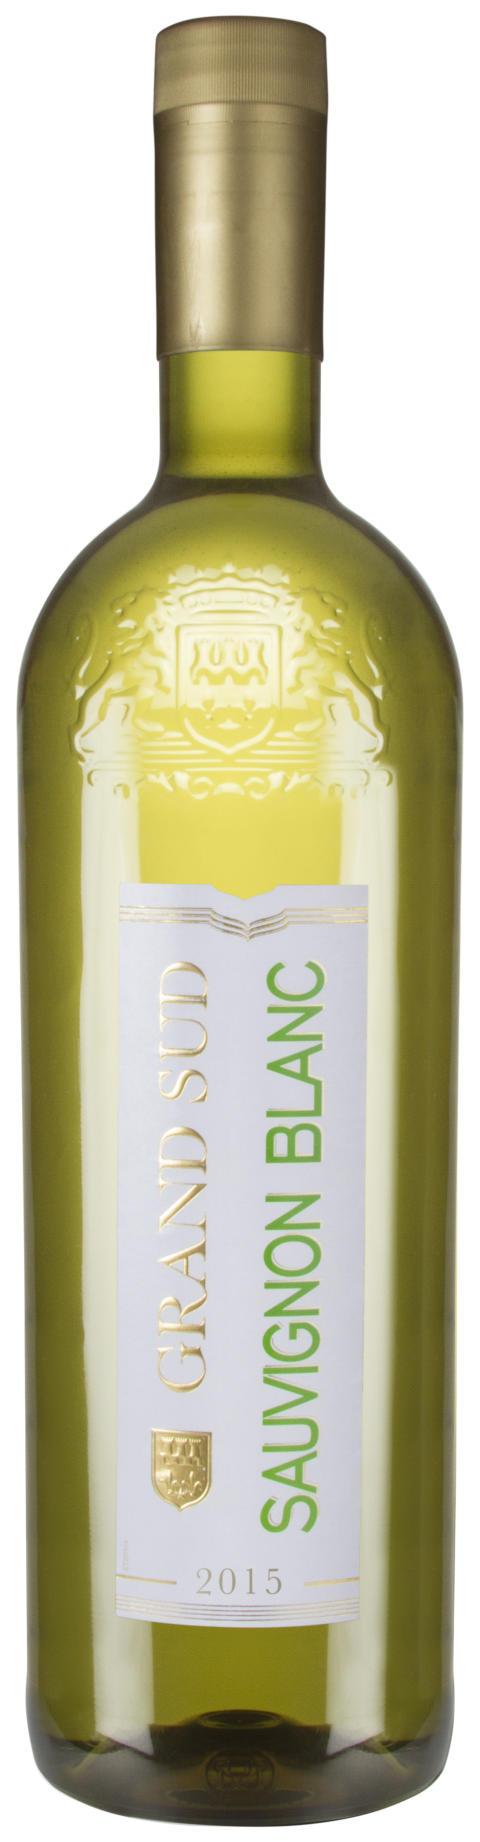 Grand Sud Sauvignon Blanc på Systembolagshyllan